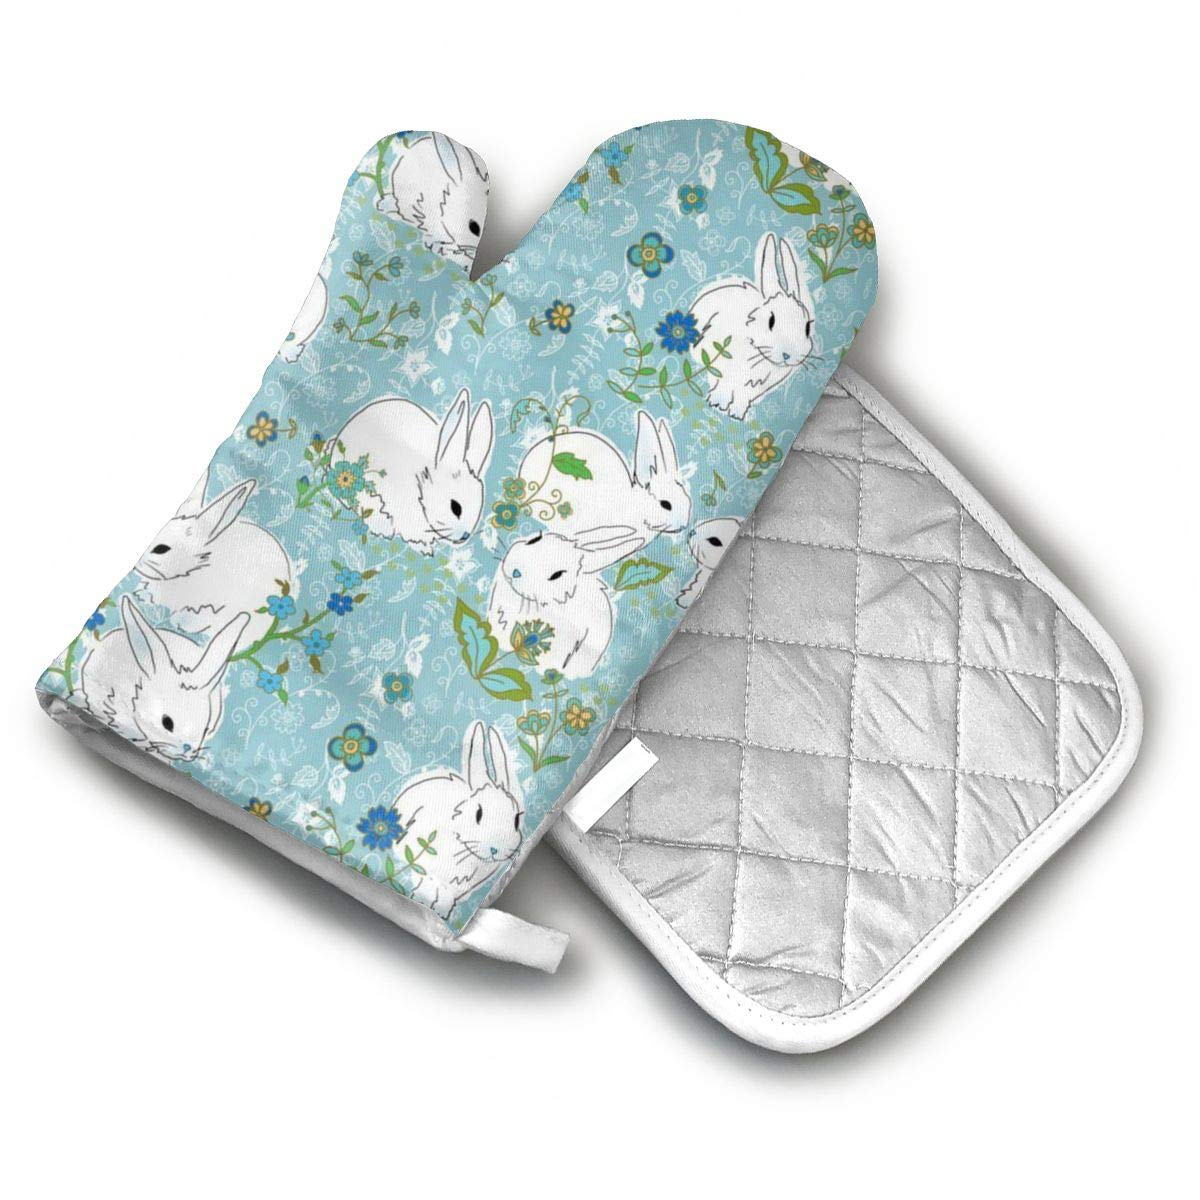 AISDHAJKSD Love Bunny Rabbit Premium Terylene/Nylon Oven Mitts and Pot Mat,Pot Mat/Hot Pads, Heat Resistant Gloves BBQ Kitchen